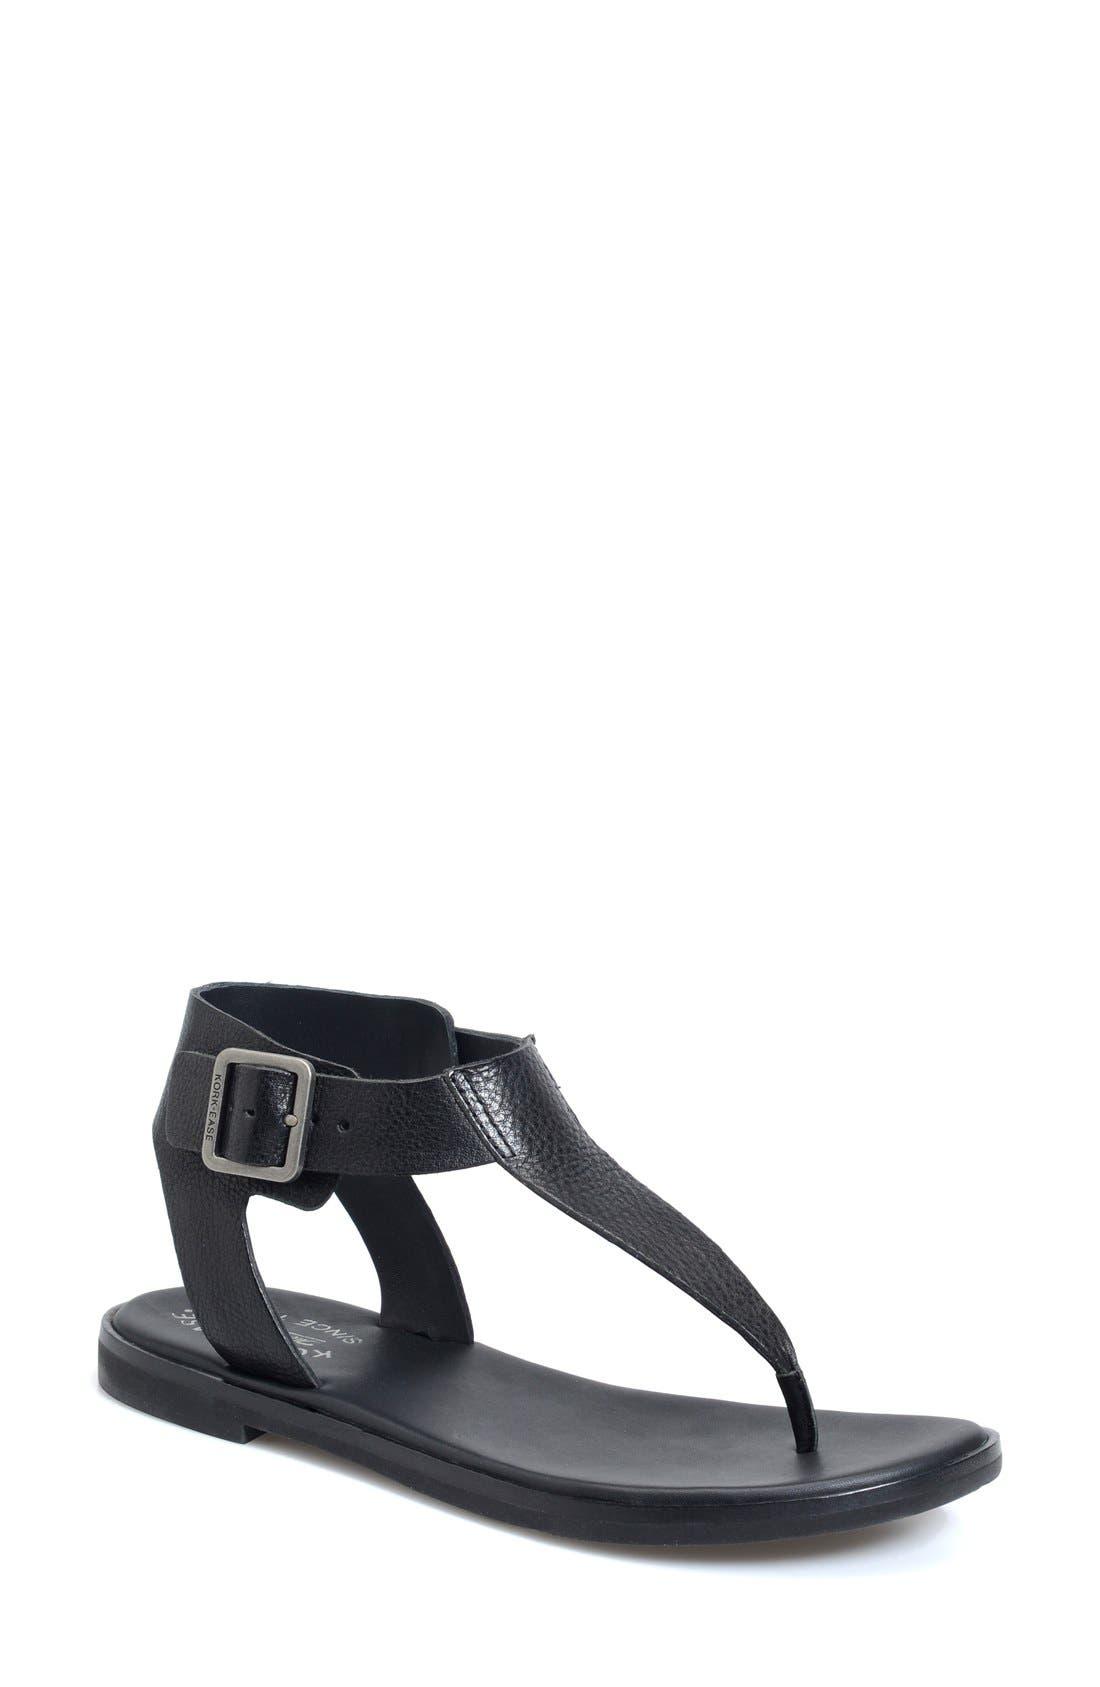 'Catriona' Flat Sandal,                             Main thumbnail 1, color,                             001